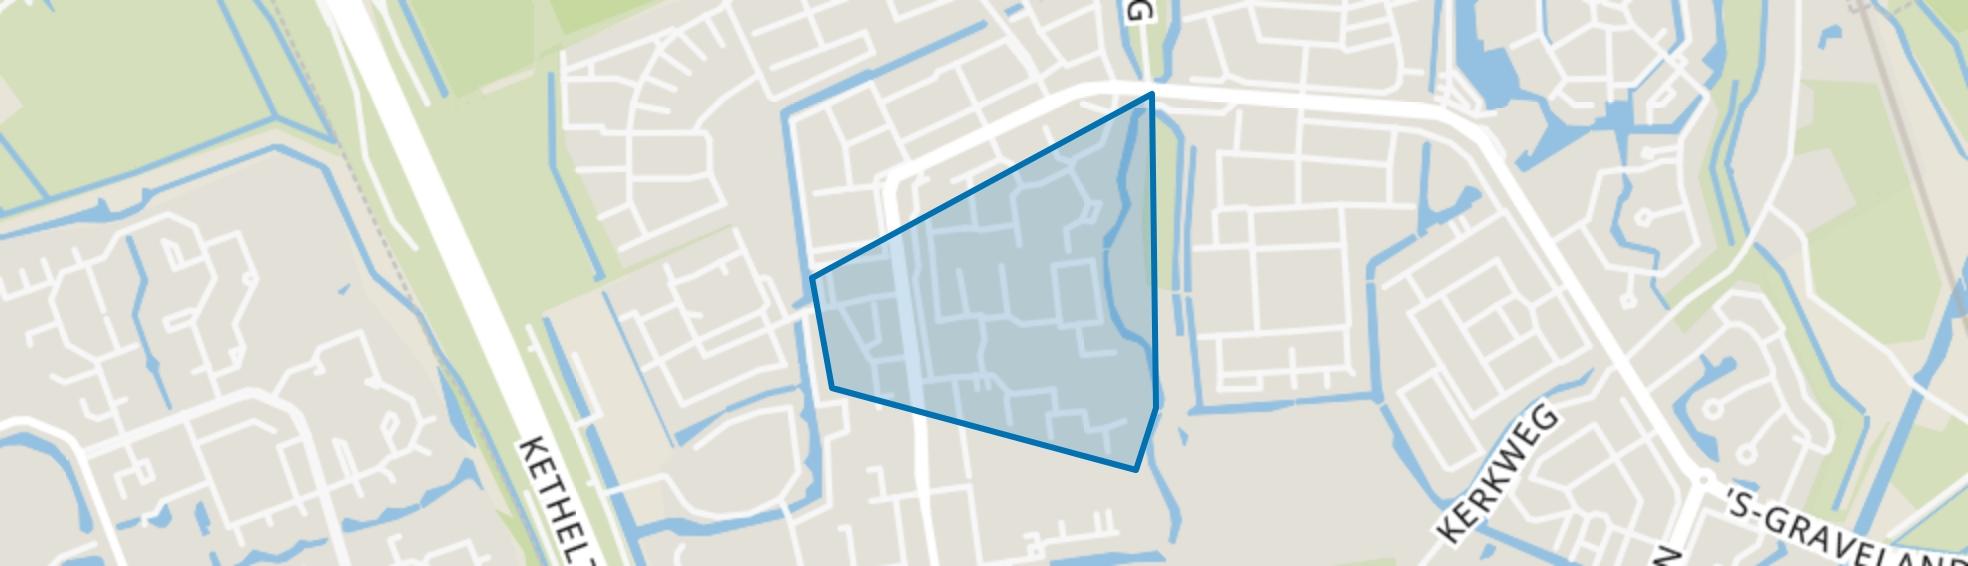 Botenbuurt, Schiedam map